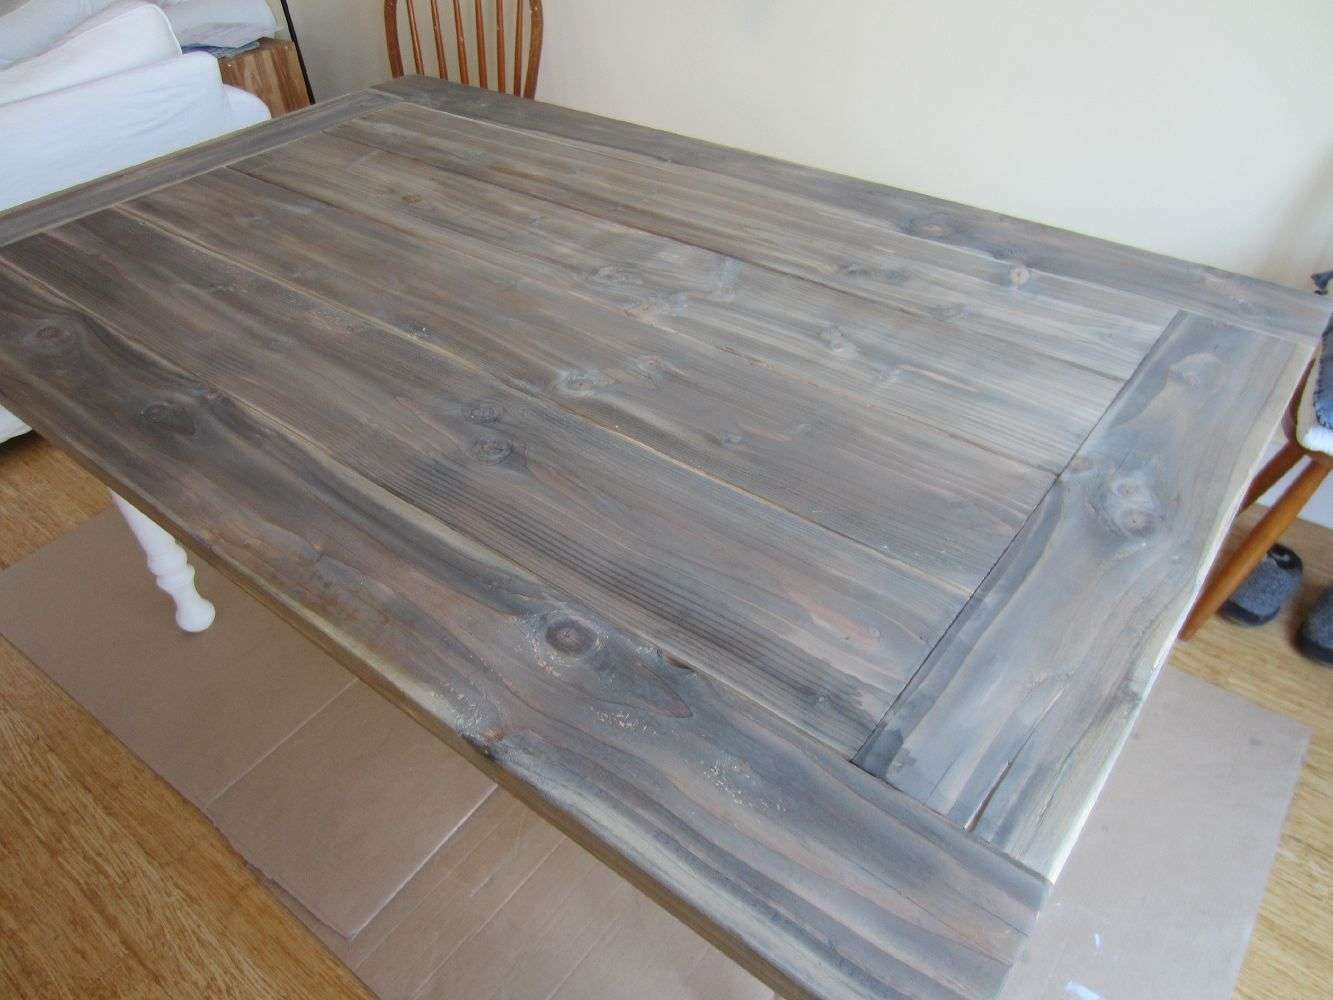 Diy instructions on how to build a farm table for the for Instructions on how to build a table